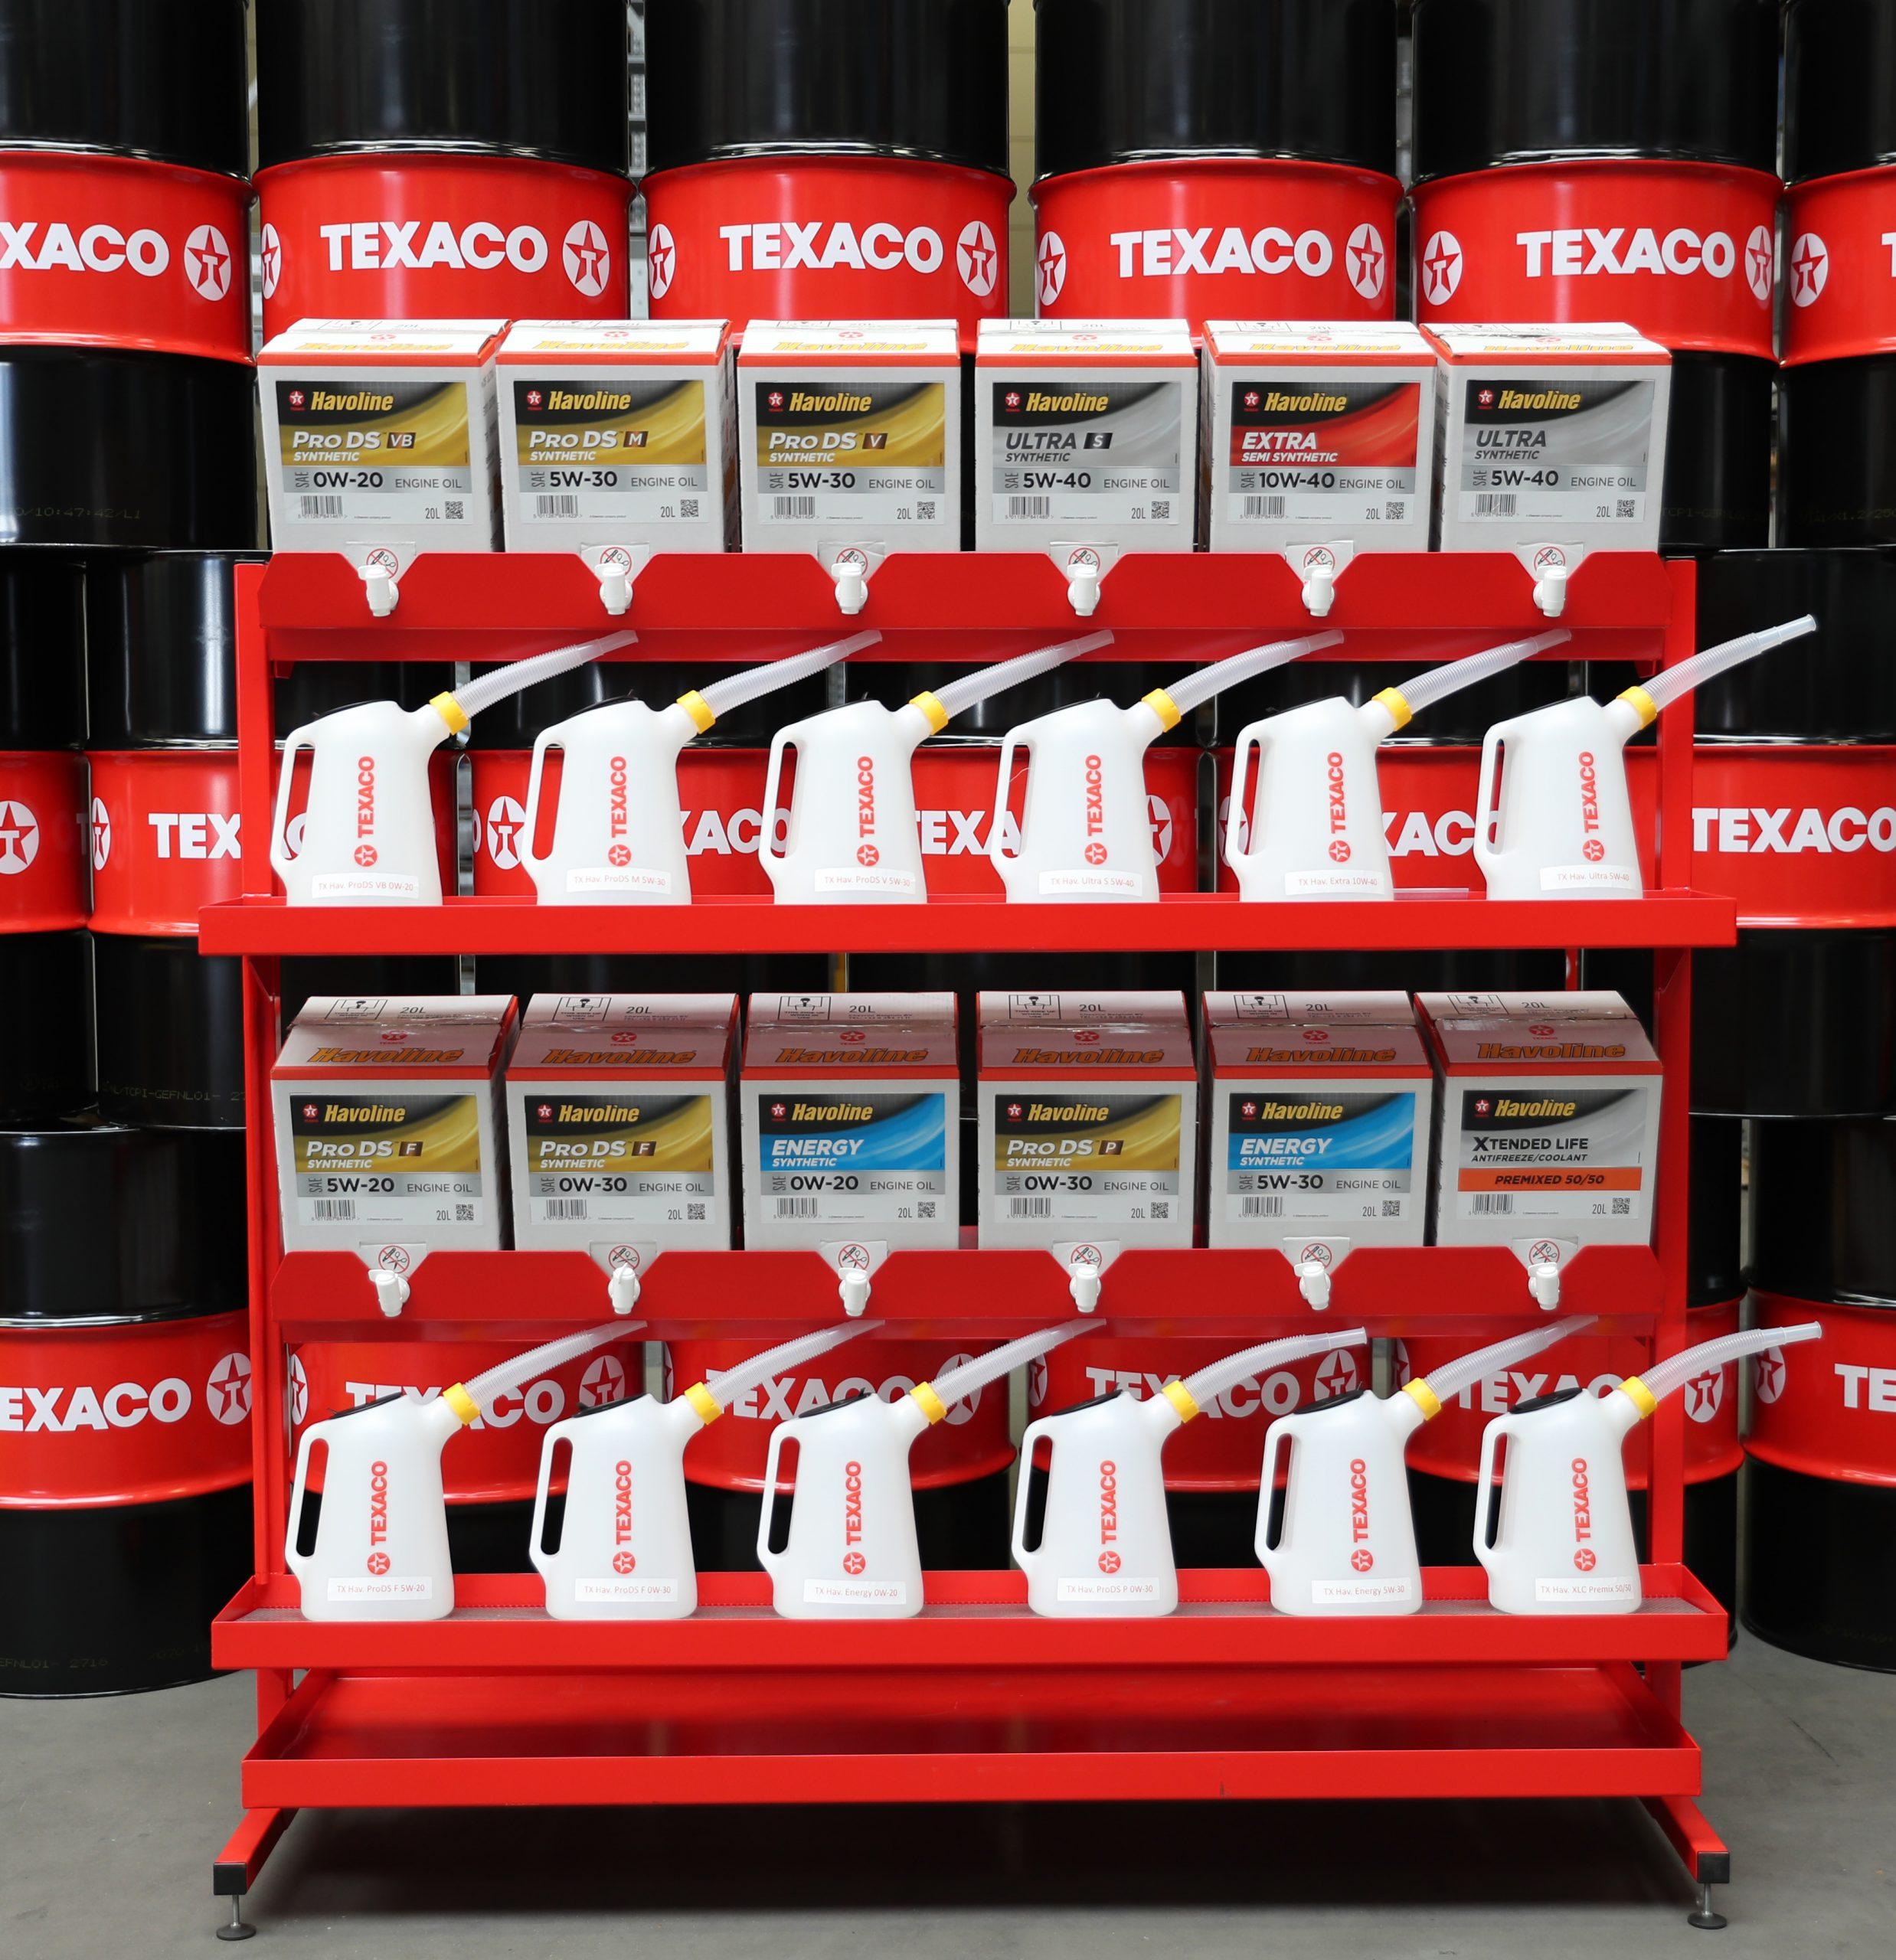 Nieuw: Texaco Bag-in-Box